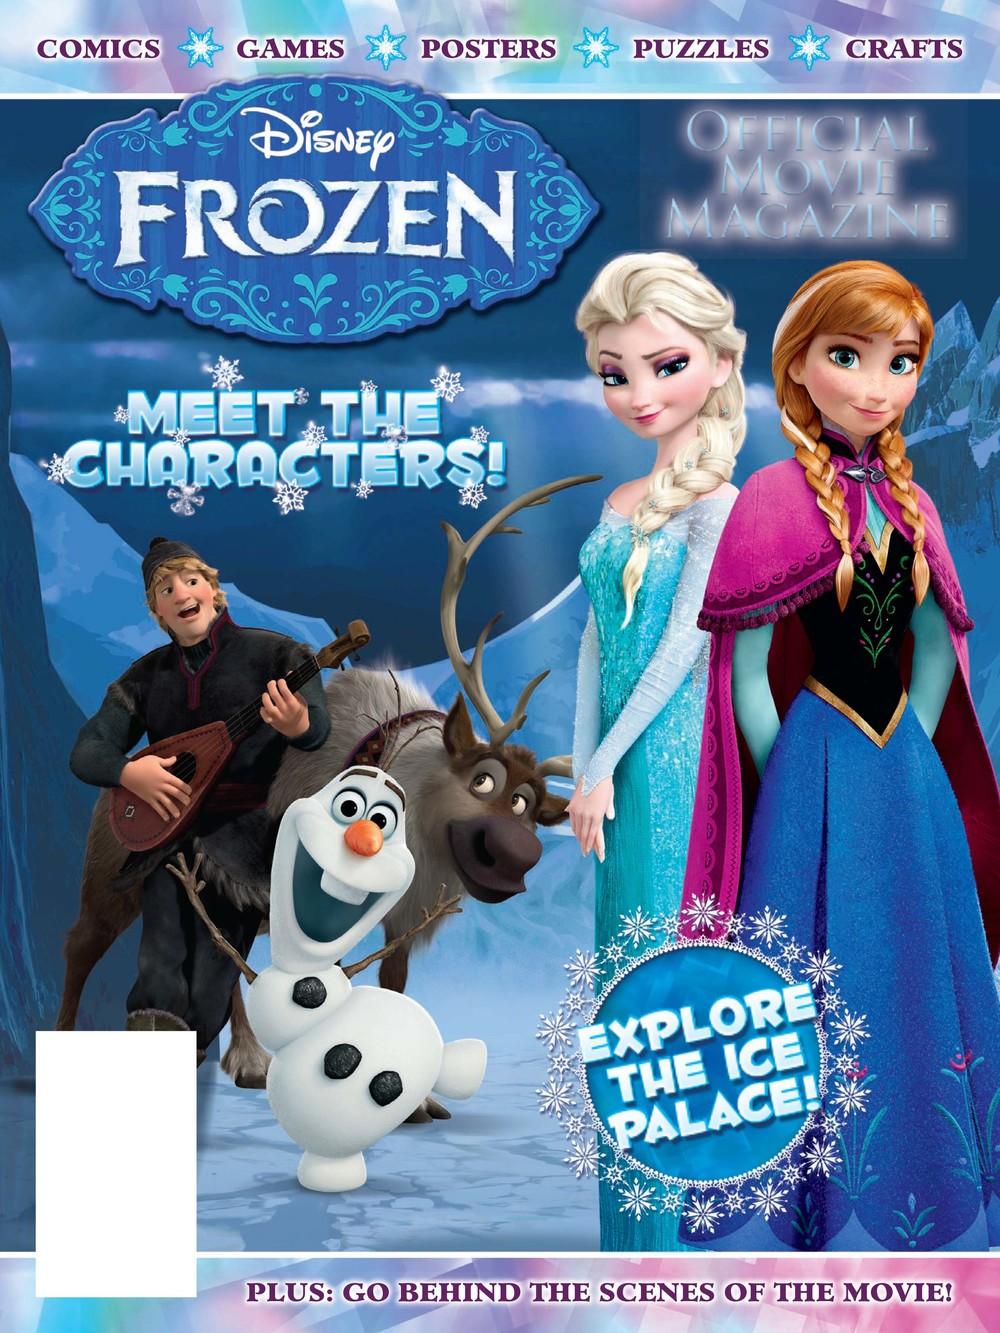 Disney_FRZ_C1-48_090613.jpg